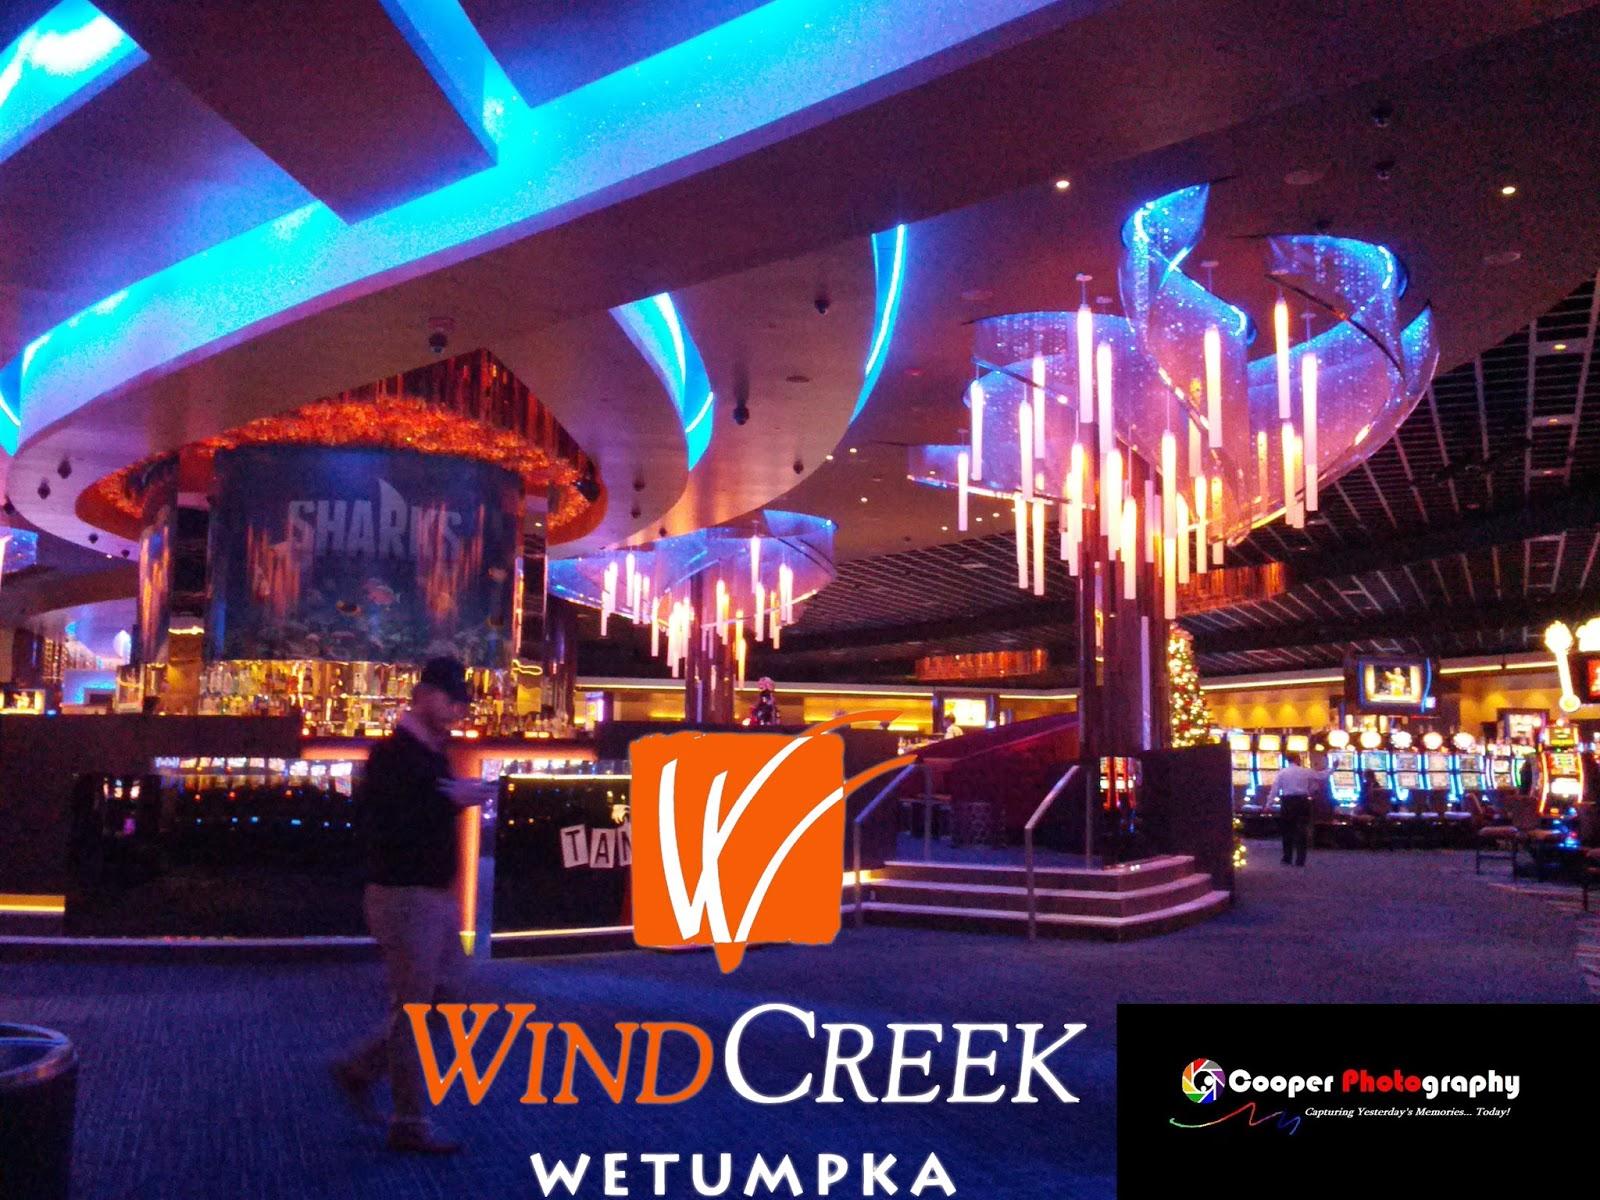 Wind Creek Casino And Hotel In Wetumpka Alabama